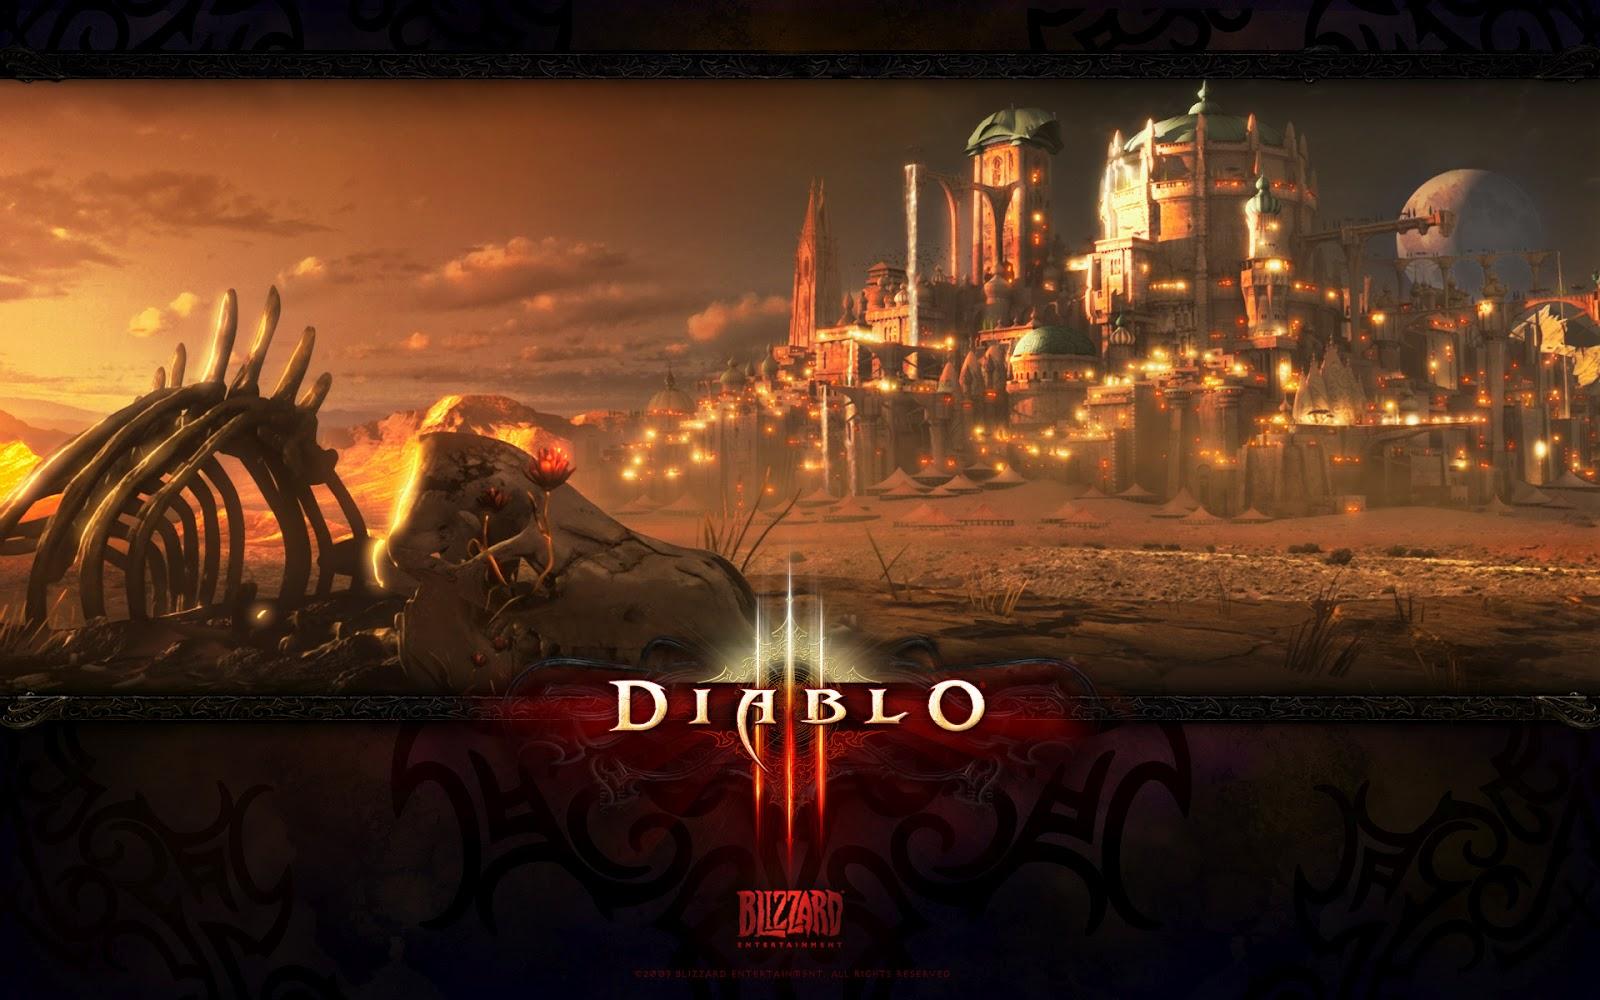 Wallpaper Diablo 3 Hd Wallpaper